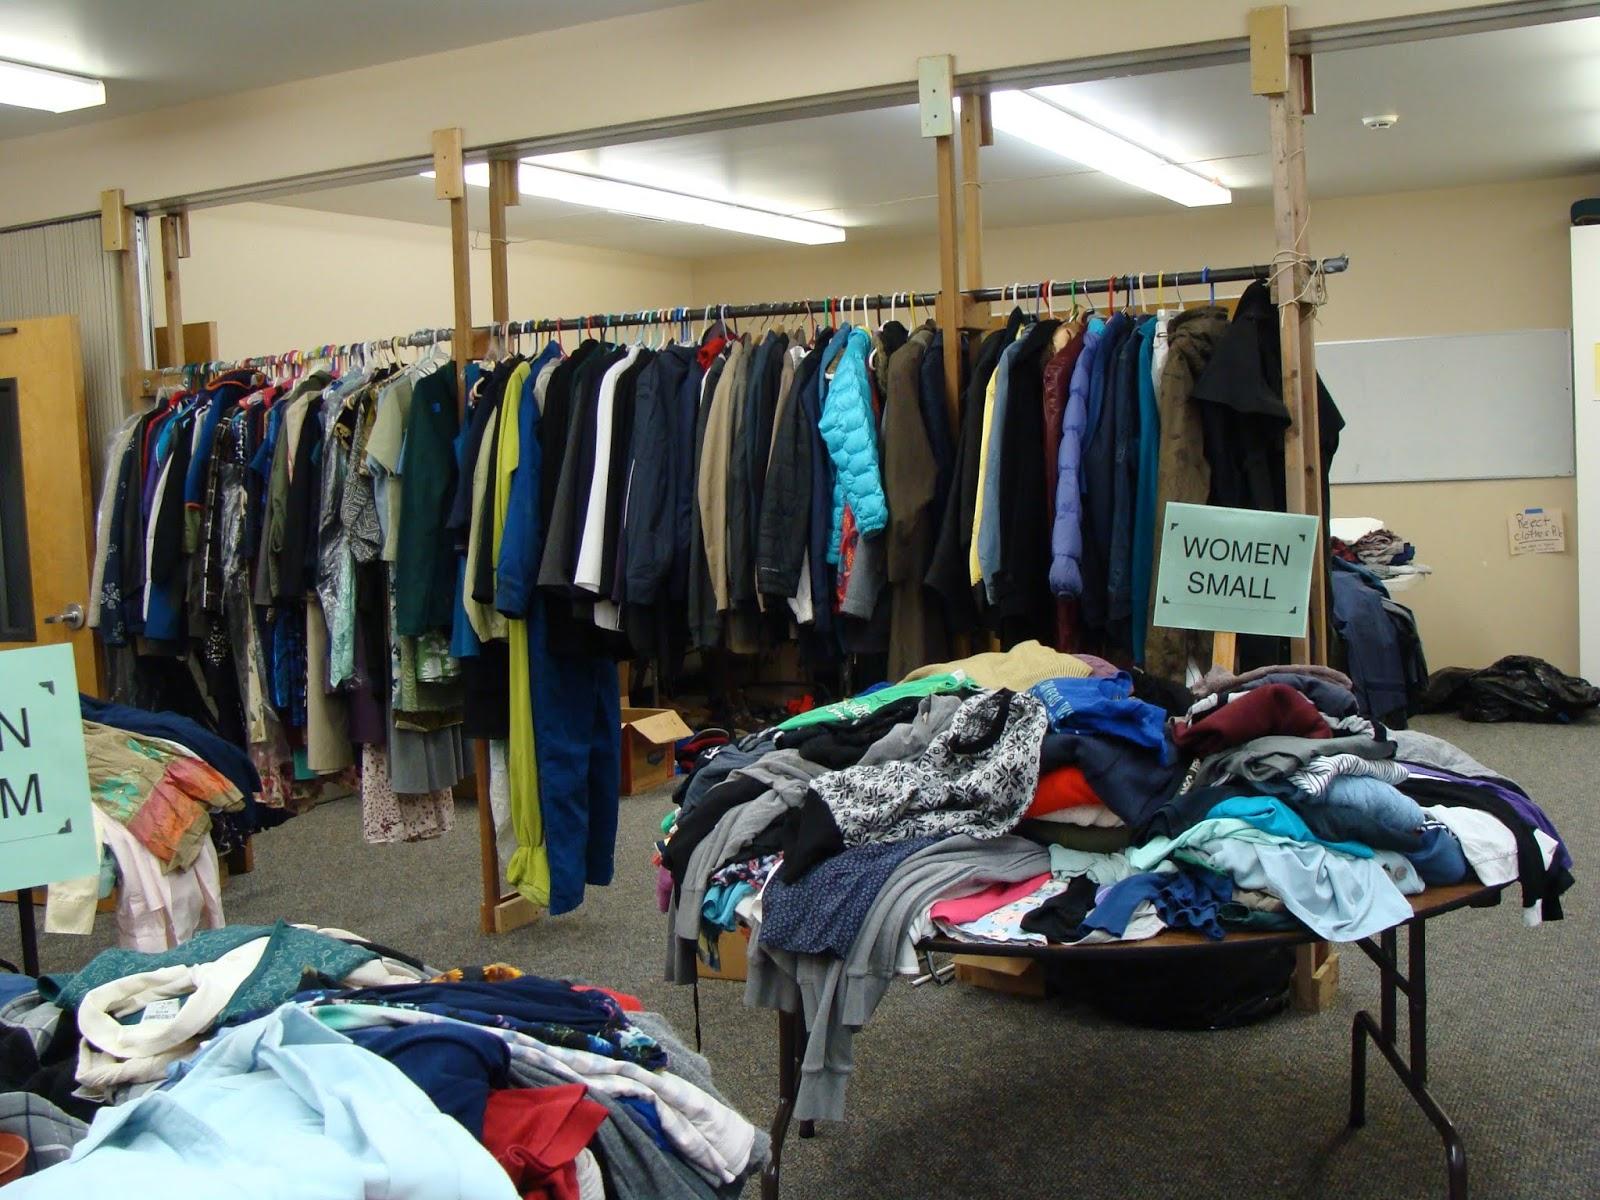 Church rummage sale Mar 2 - Shoreline Area News